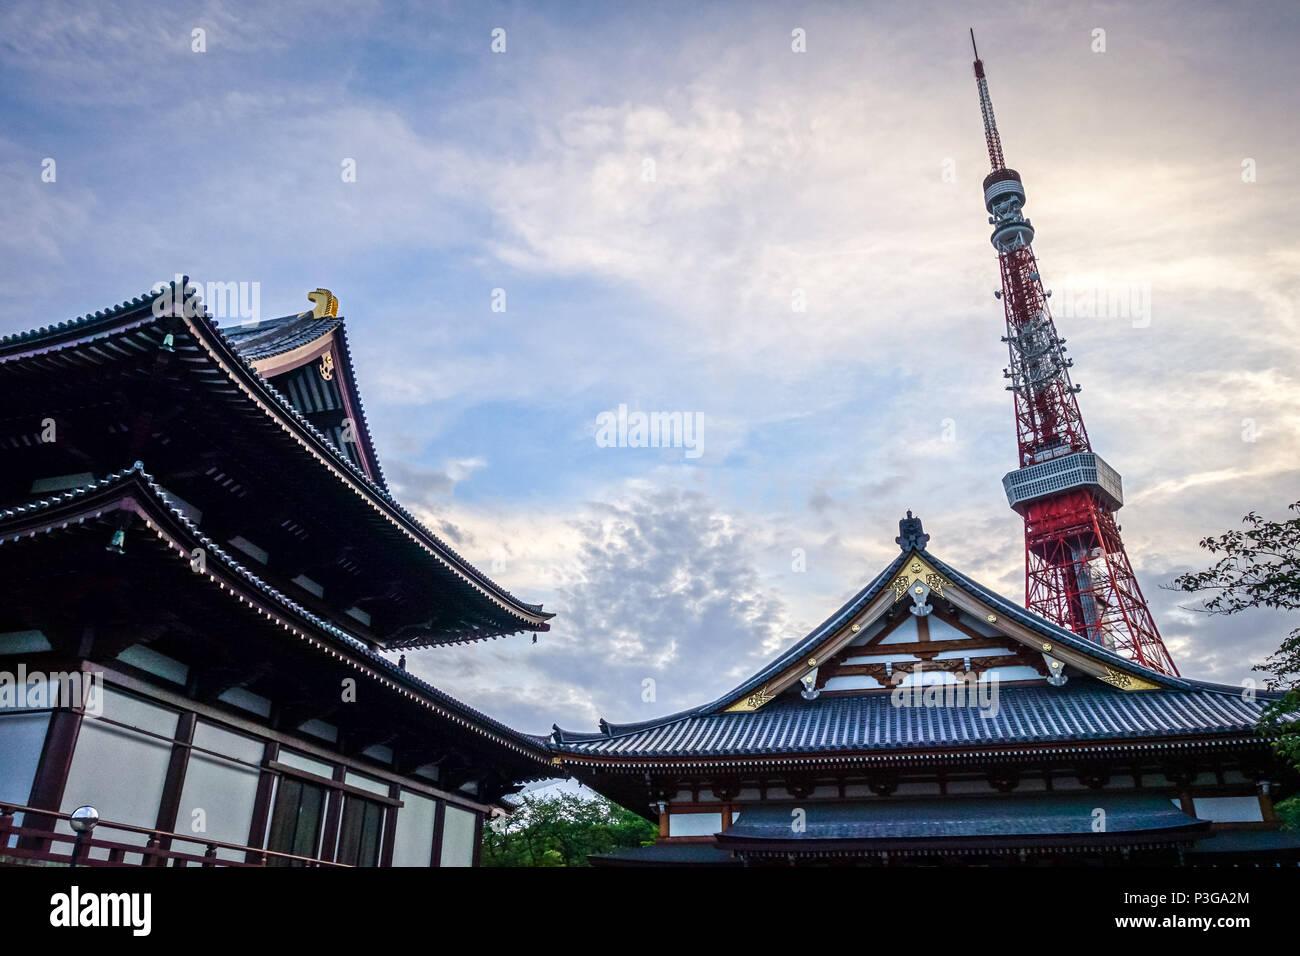 Zojo-ji temple and Tokyo tower at sunset, Japan - Stock Image